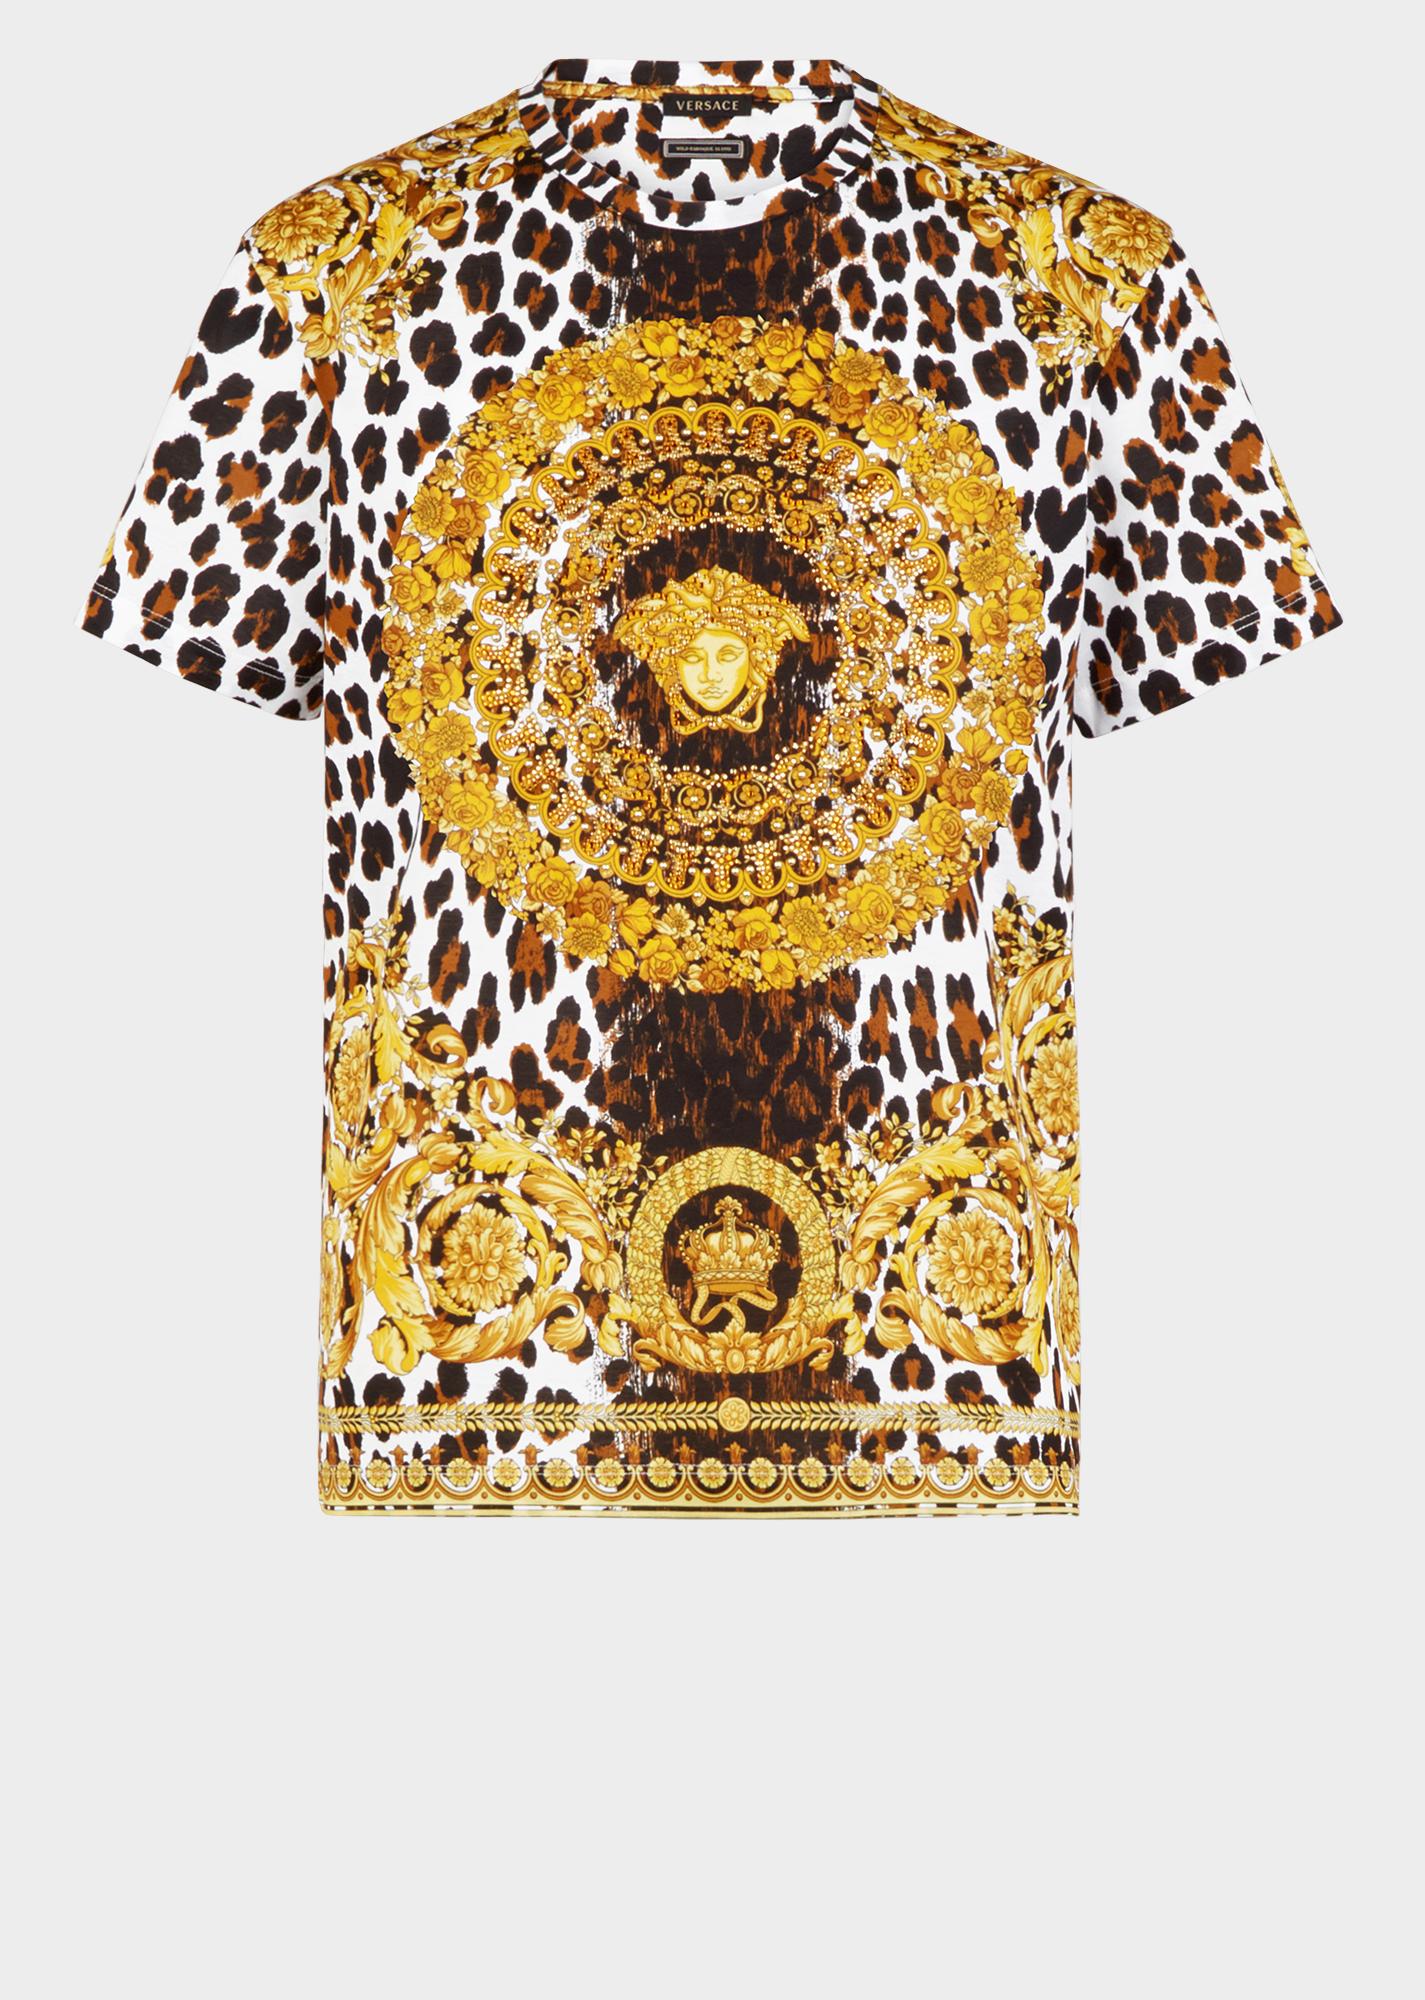 Wild Baroque Tribute T Shirt For Women Us Online Store Versace Shirts Versace T Shirt Versace Men